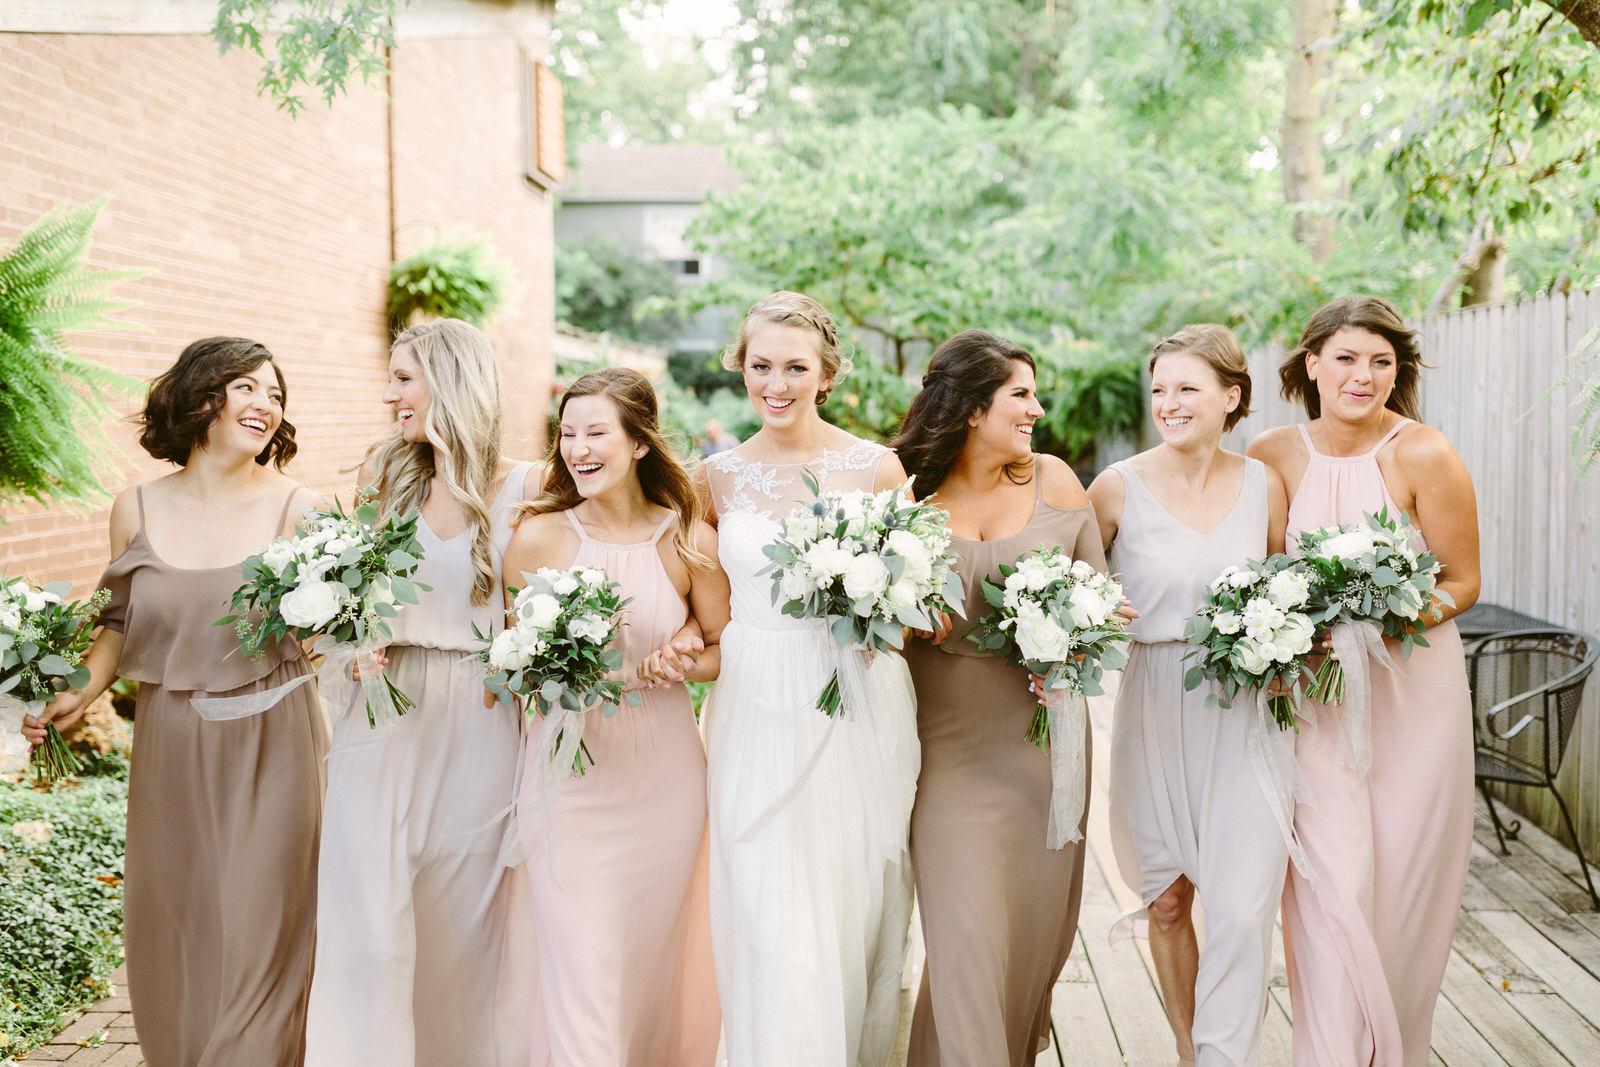 KatiMallory-Fayetteville Wedding Florist-2076.JPG